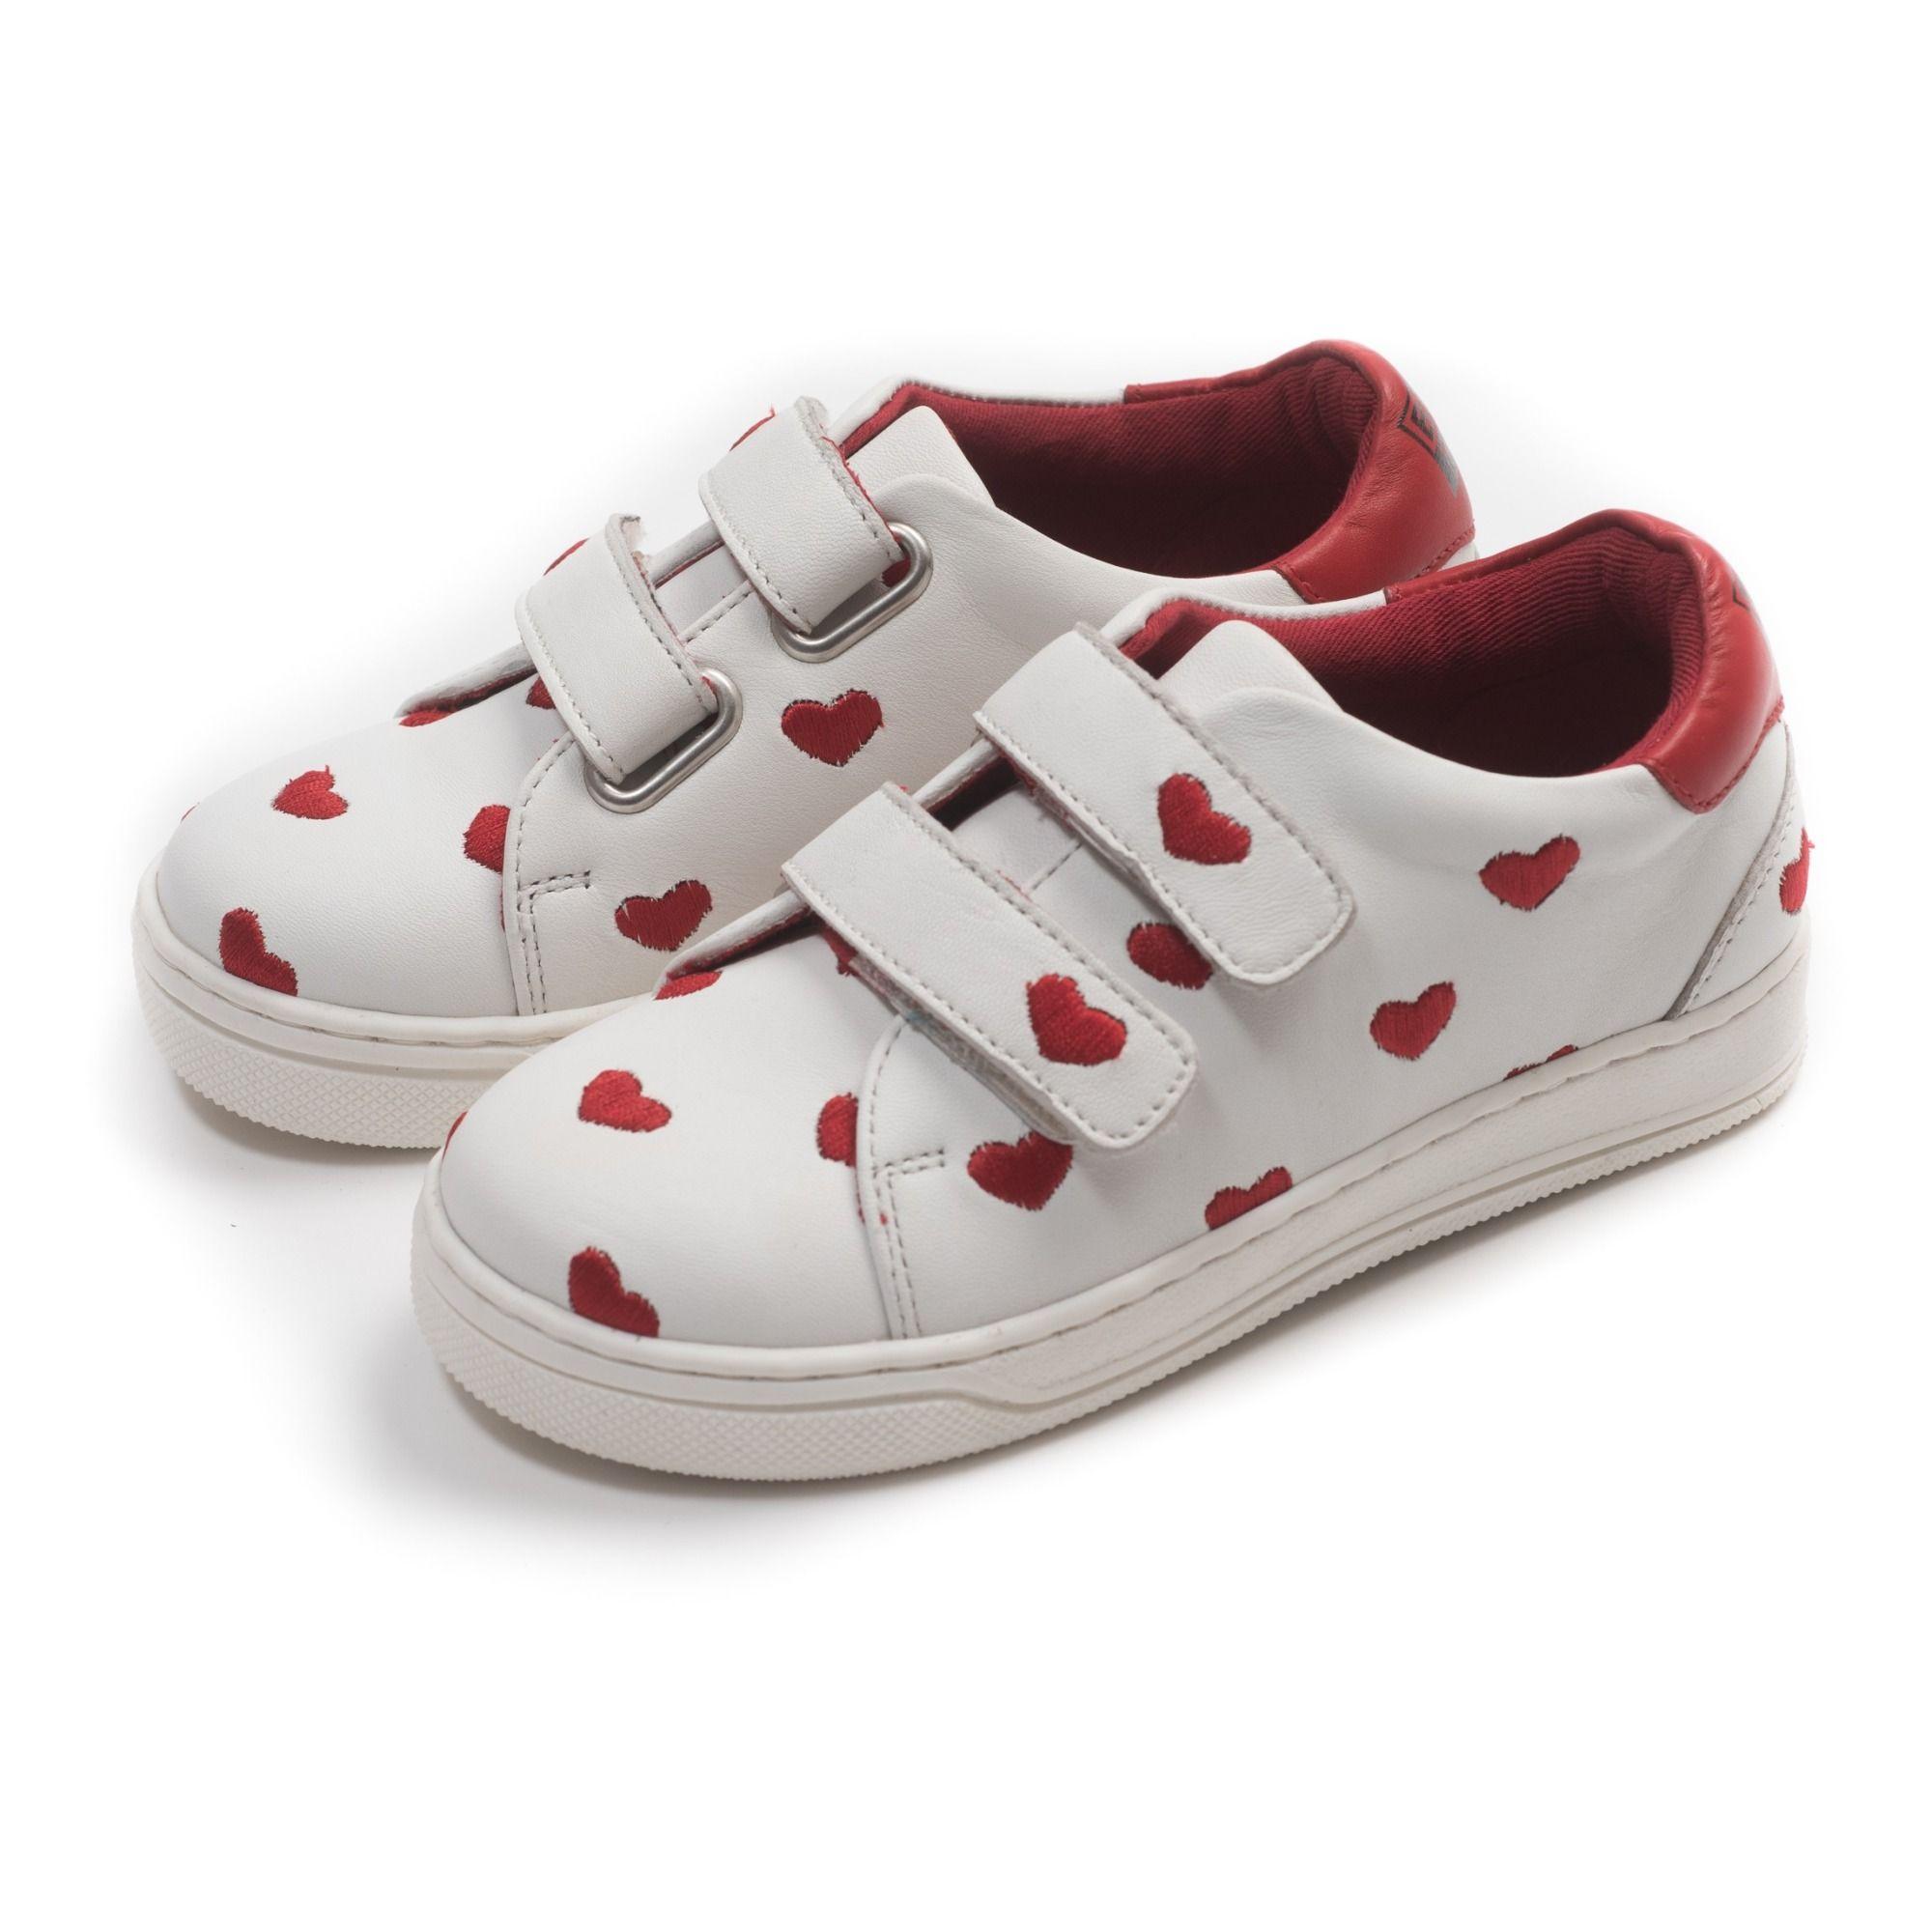 Bonton Shoes Baby